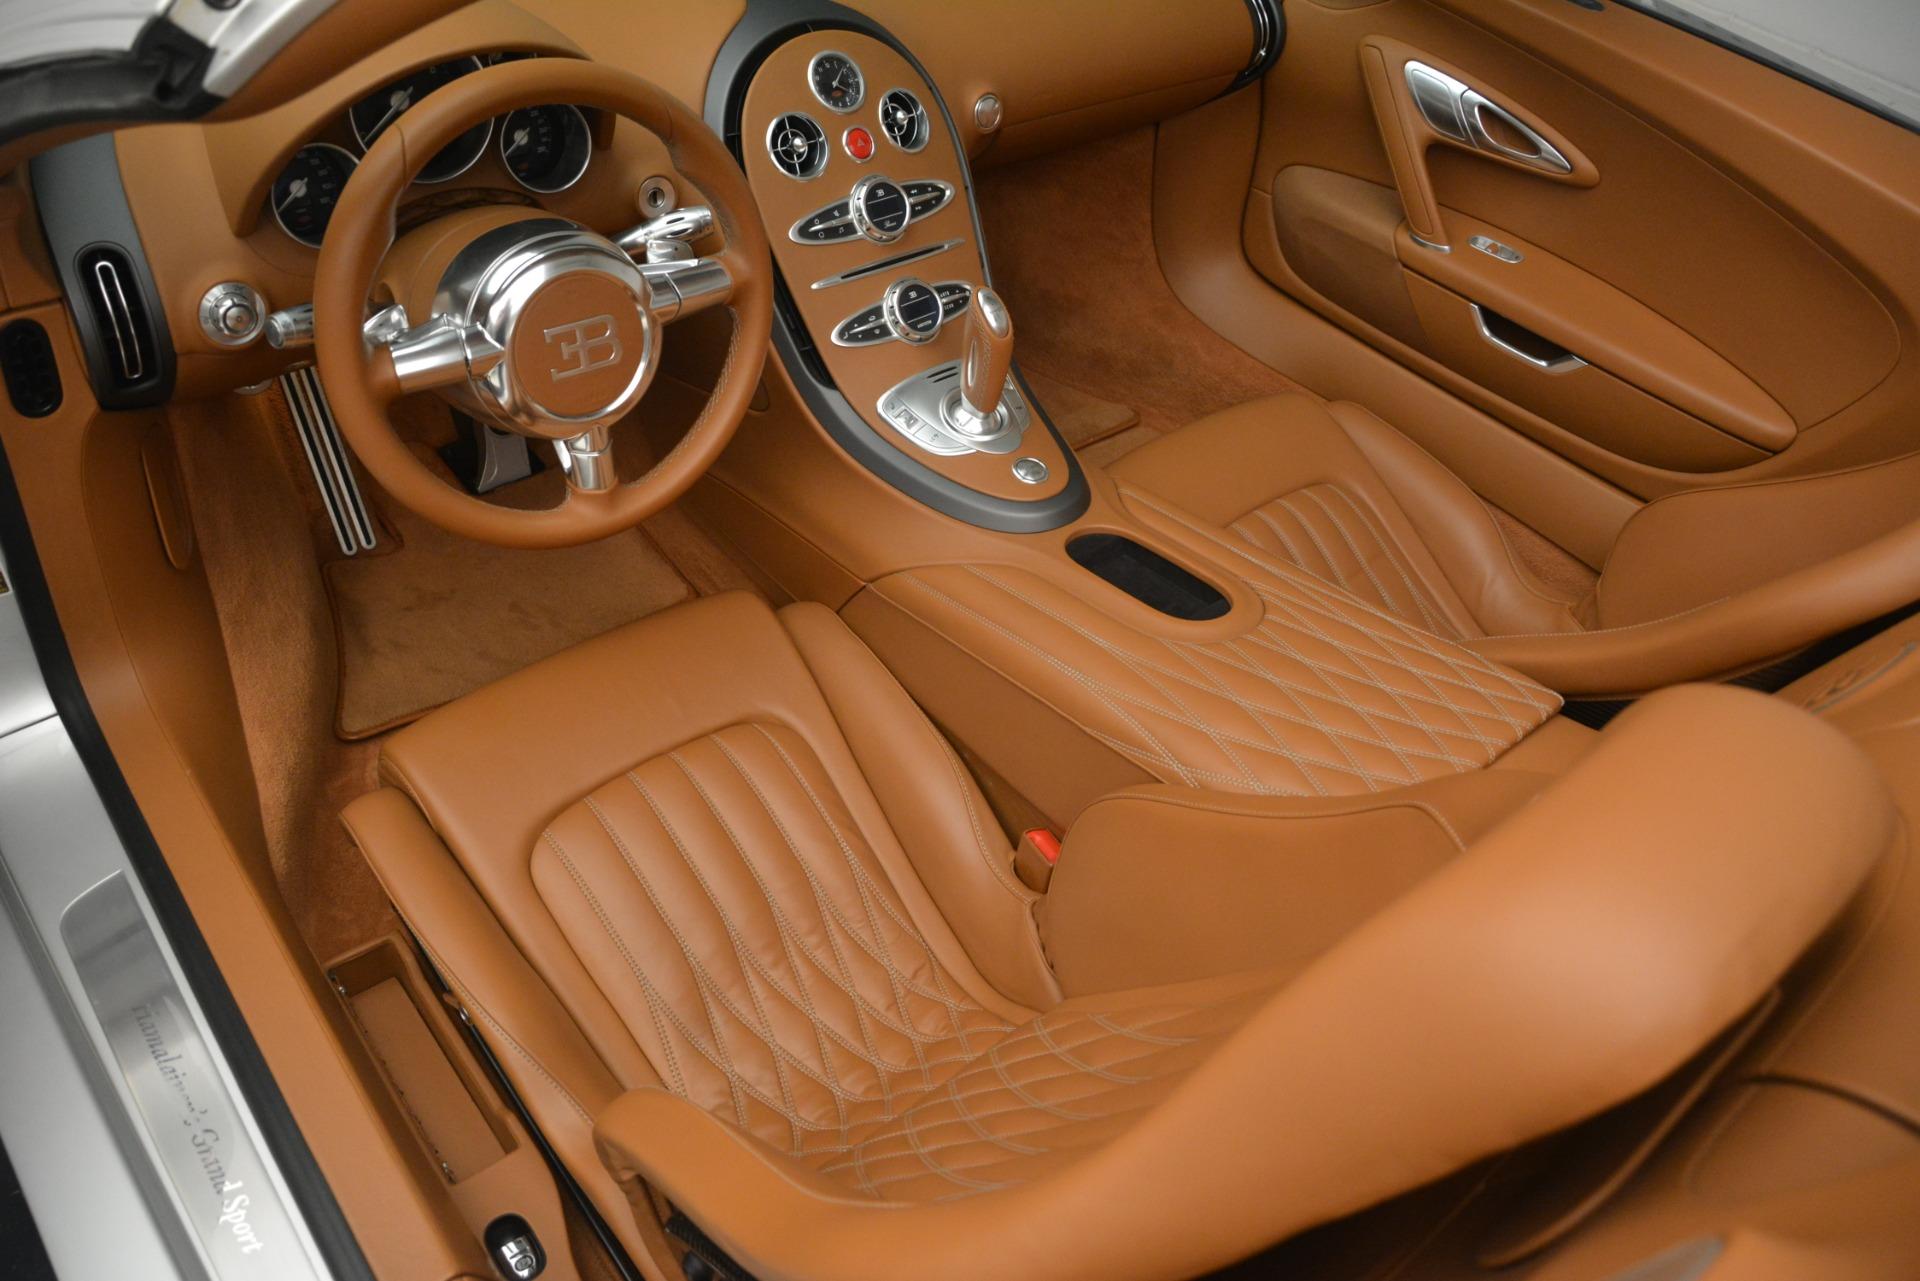 Used 2010 Bugatti Veyron 16.4 Grand Sport For Sale In Greenwich, CT 3159_p23